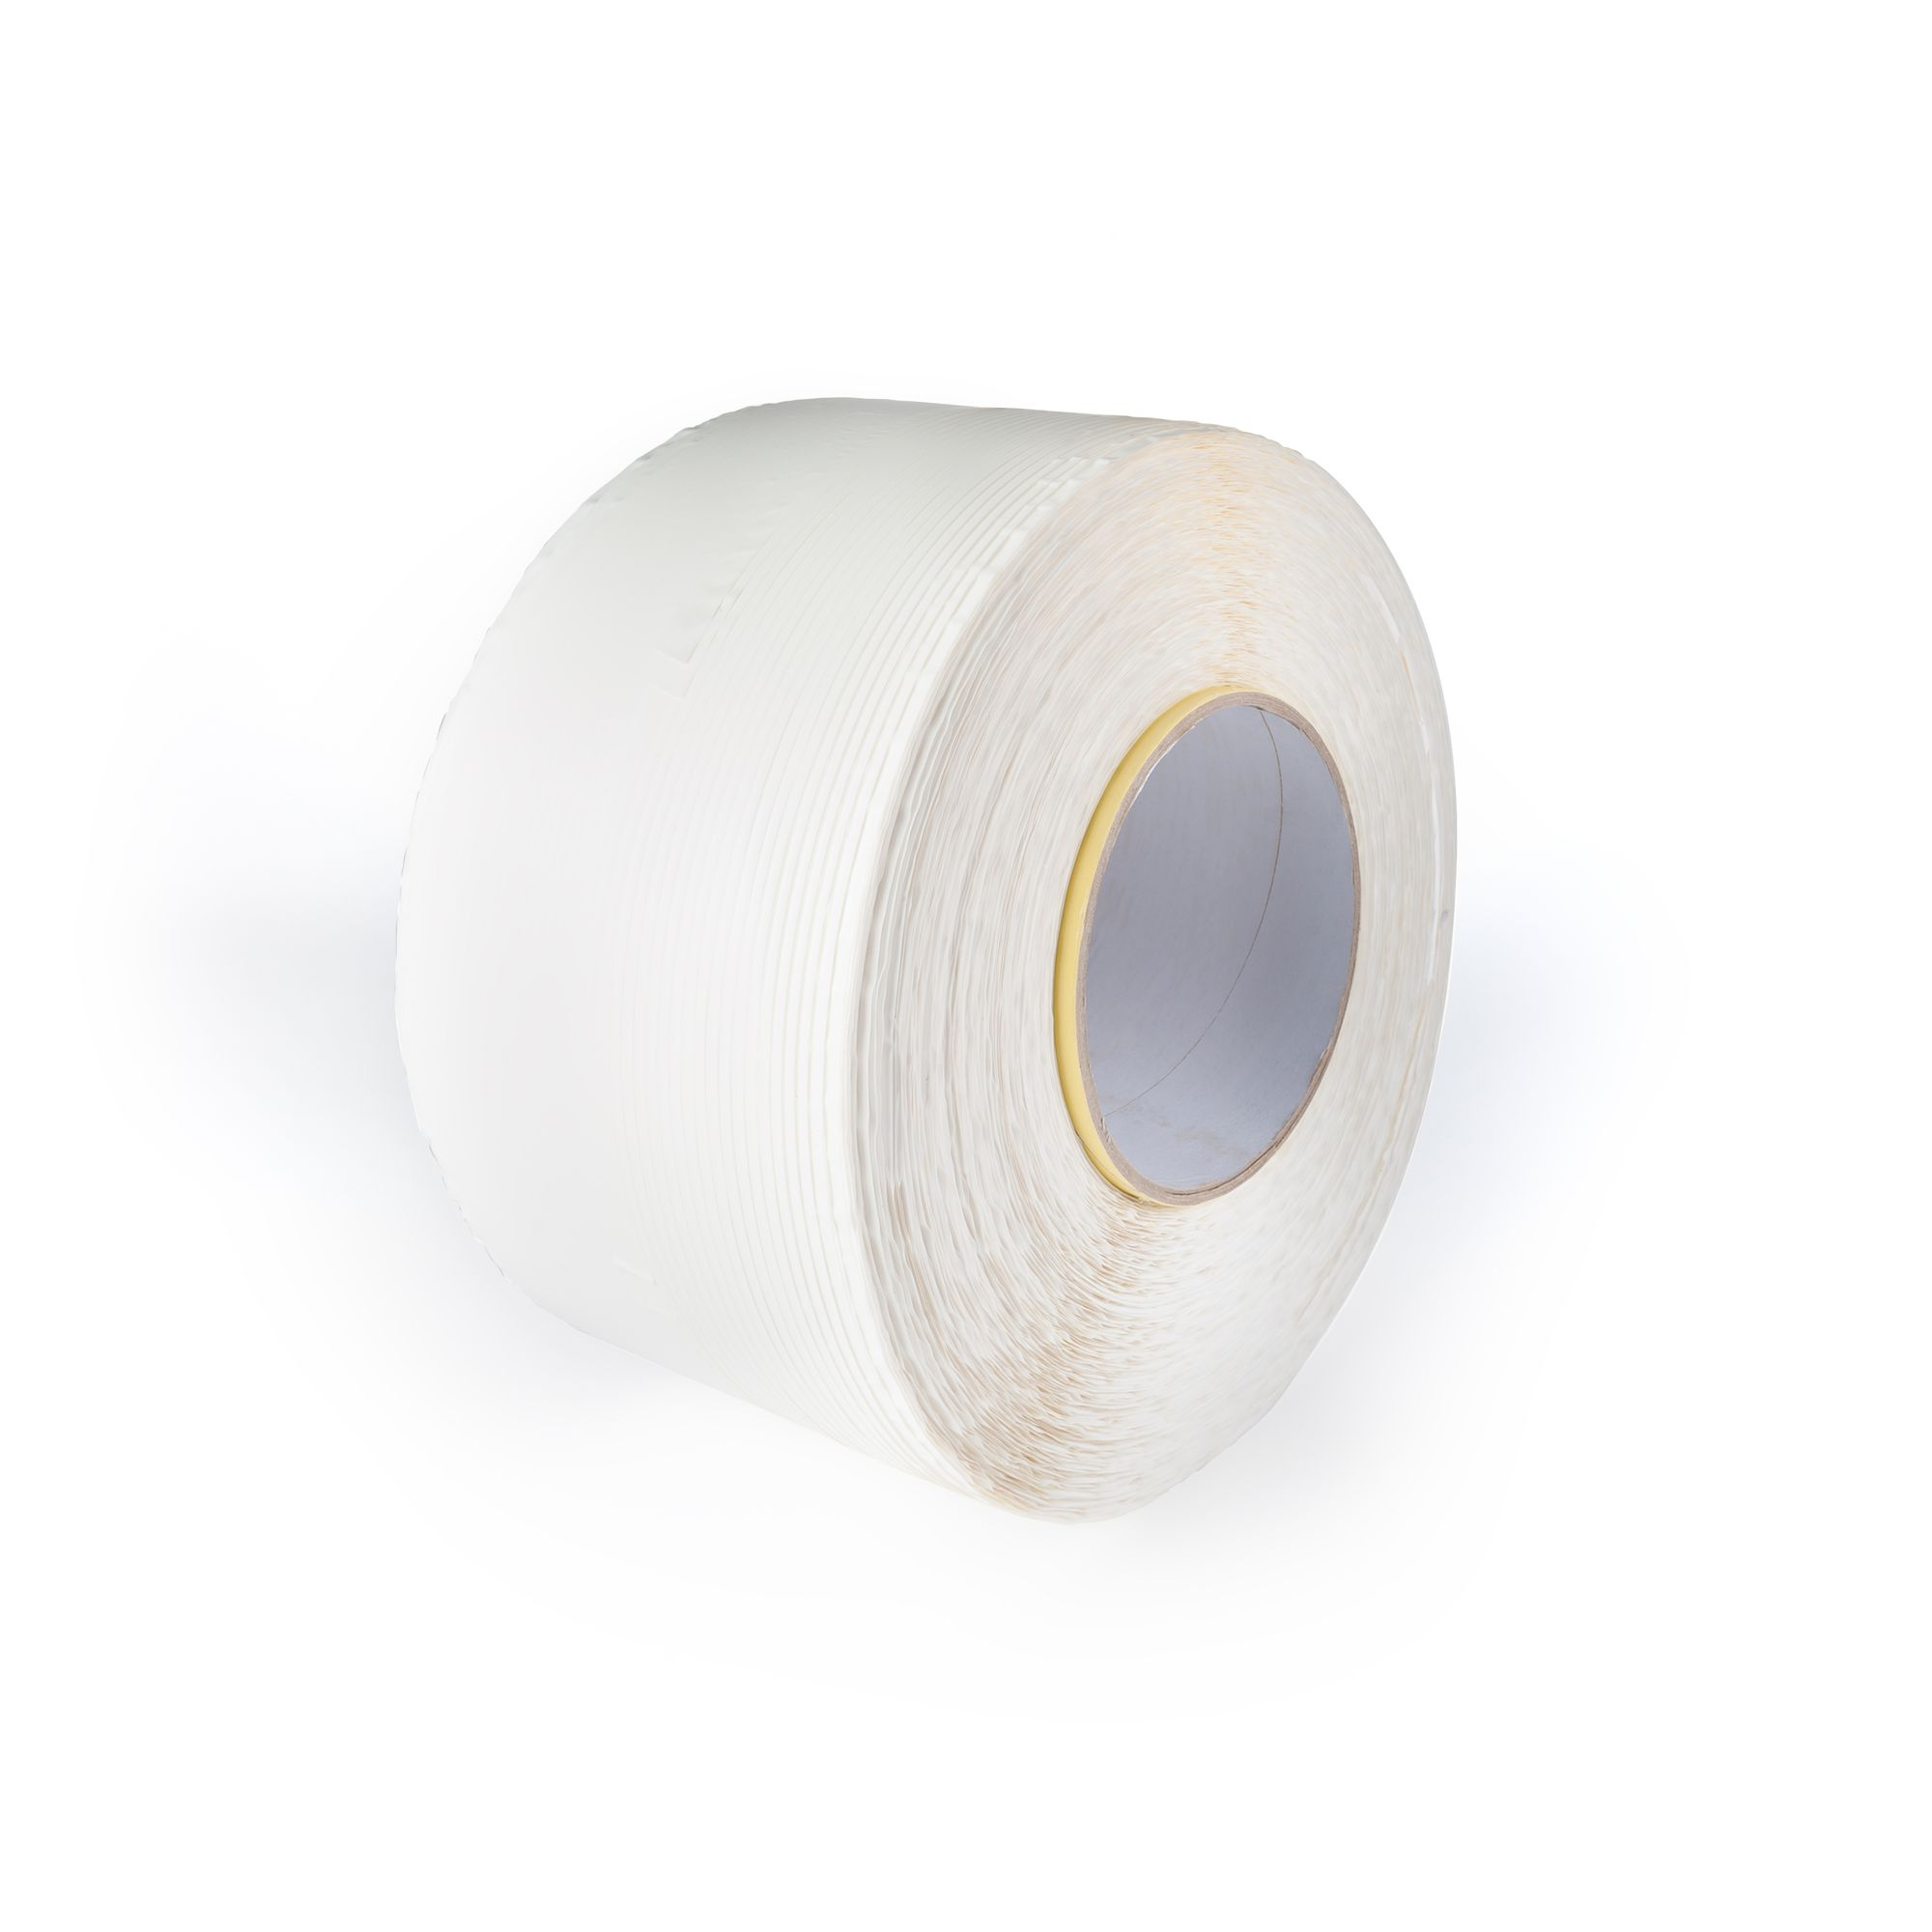 Permanent tape closures  – Hotmelt adhesive  – Tamper evident  – Hotmelt adhesive  – The security tape company  – Reseleable tape Closures  – Film transfer  – Silicone release liner  – Permanent tape closures  – http://www.kbedich.com – Cintas de cierre permanente